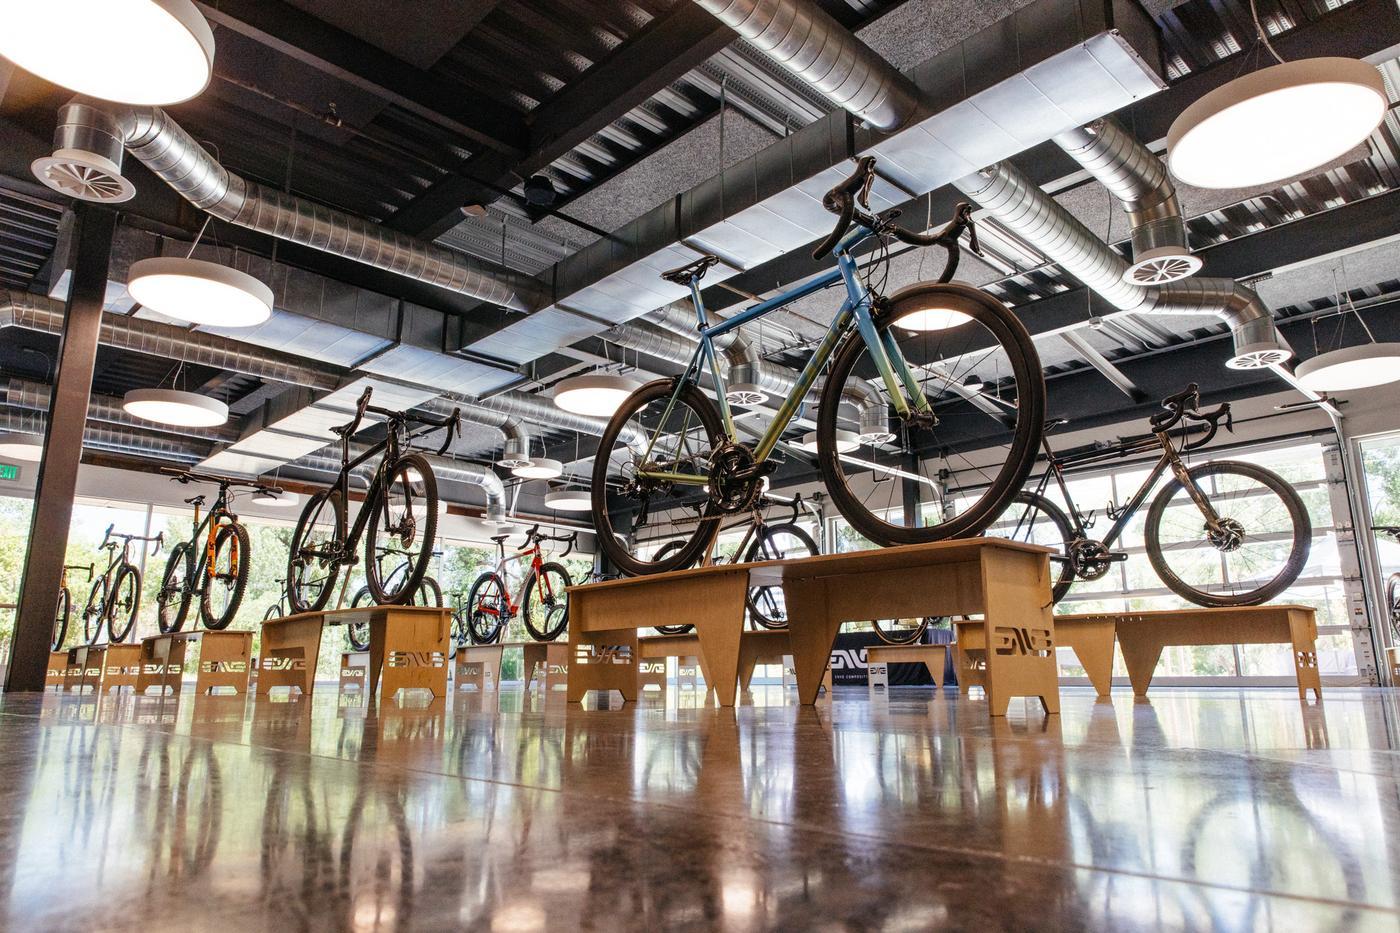 The Beautiful Bicycles of the ENVE Open House Part 02: Sklar, Falconer, Sarto, Sage, Argonaut, Moots, Retrotec, Legor, Bastion